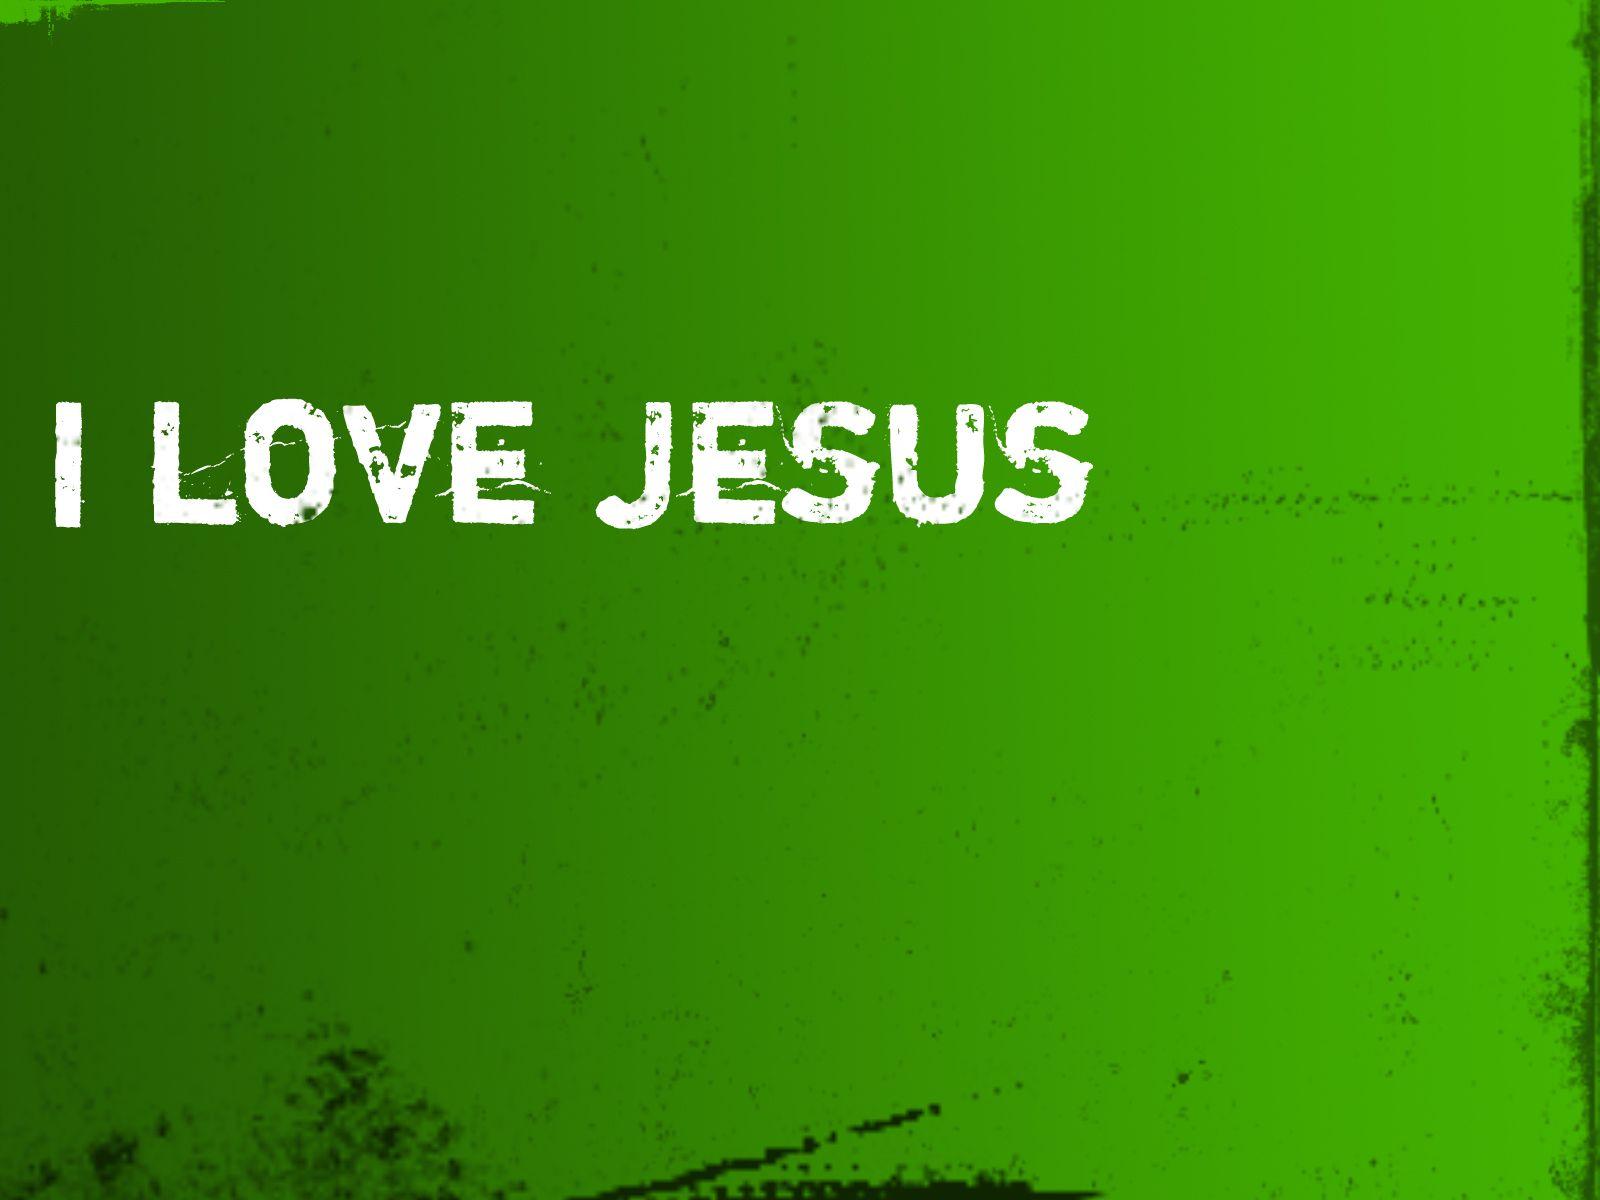 Jesus Loves Me Wallpapers Wallpapers